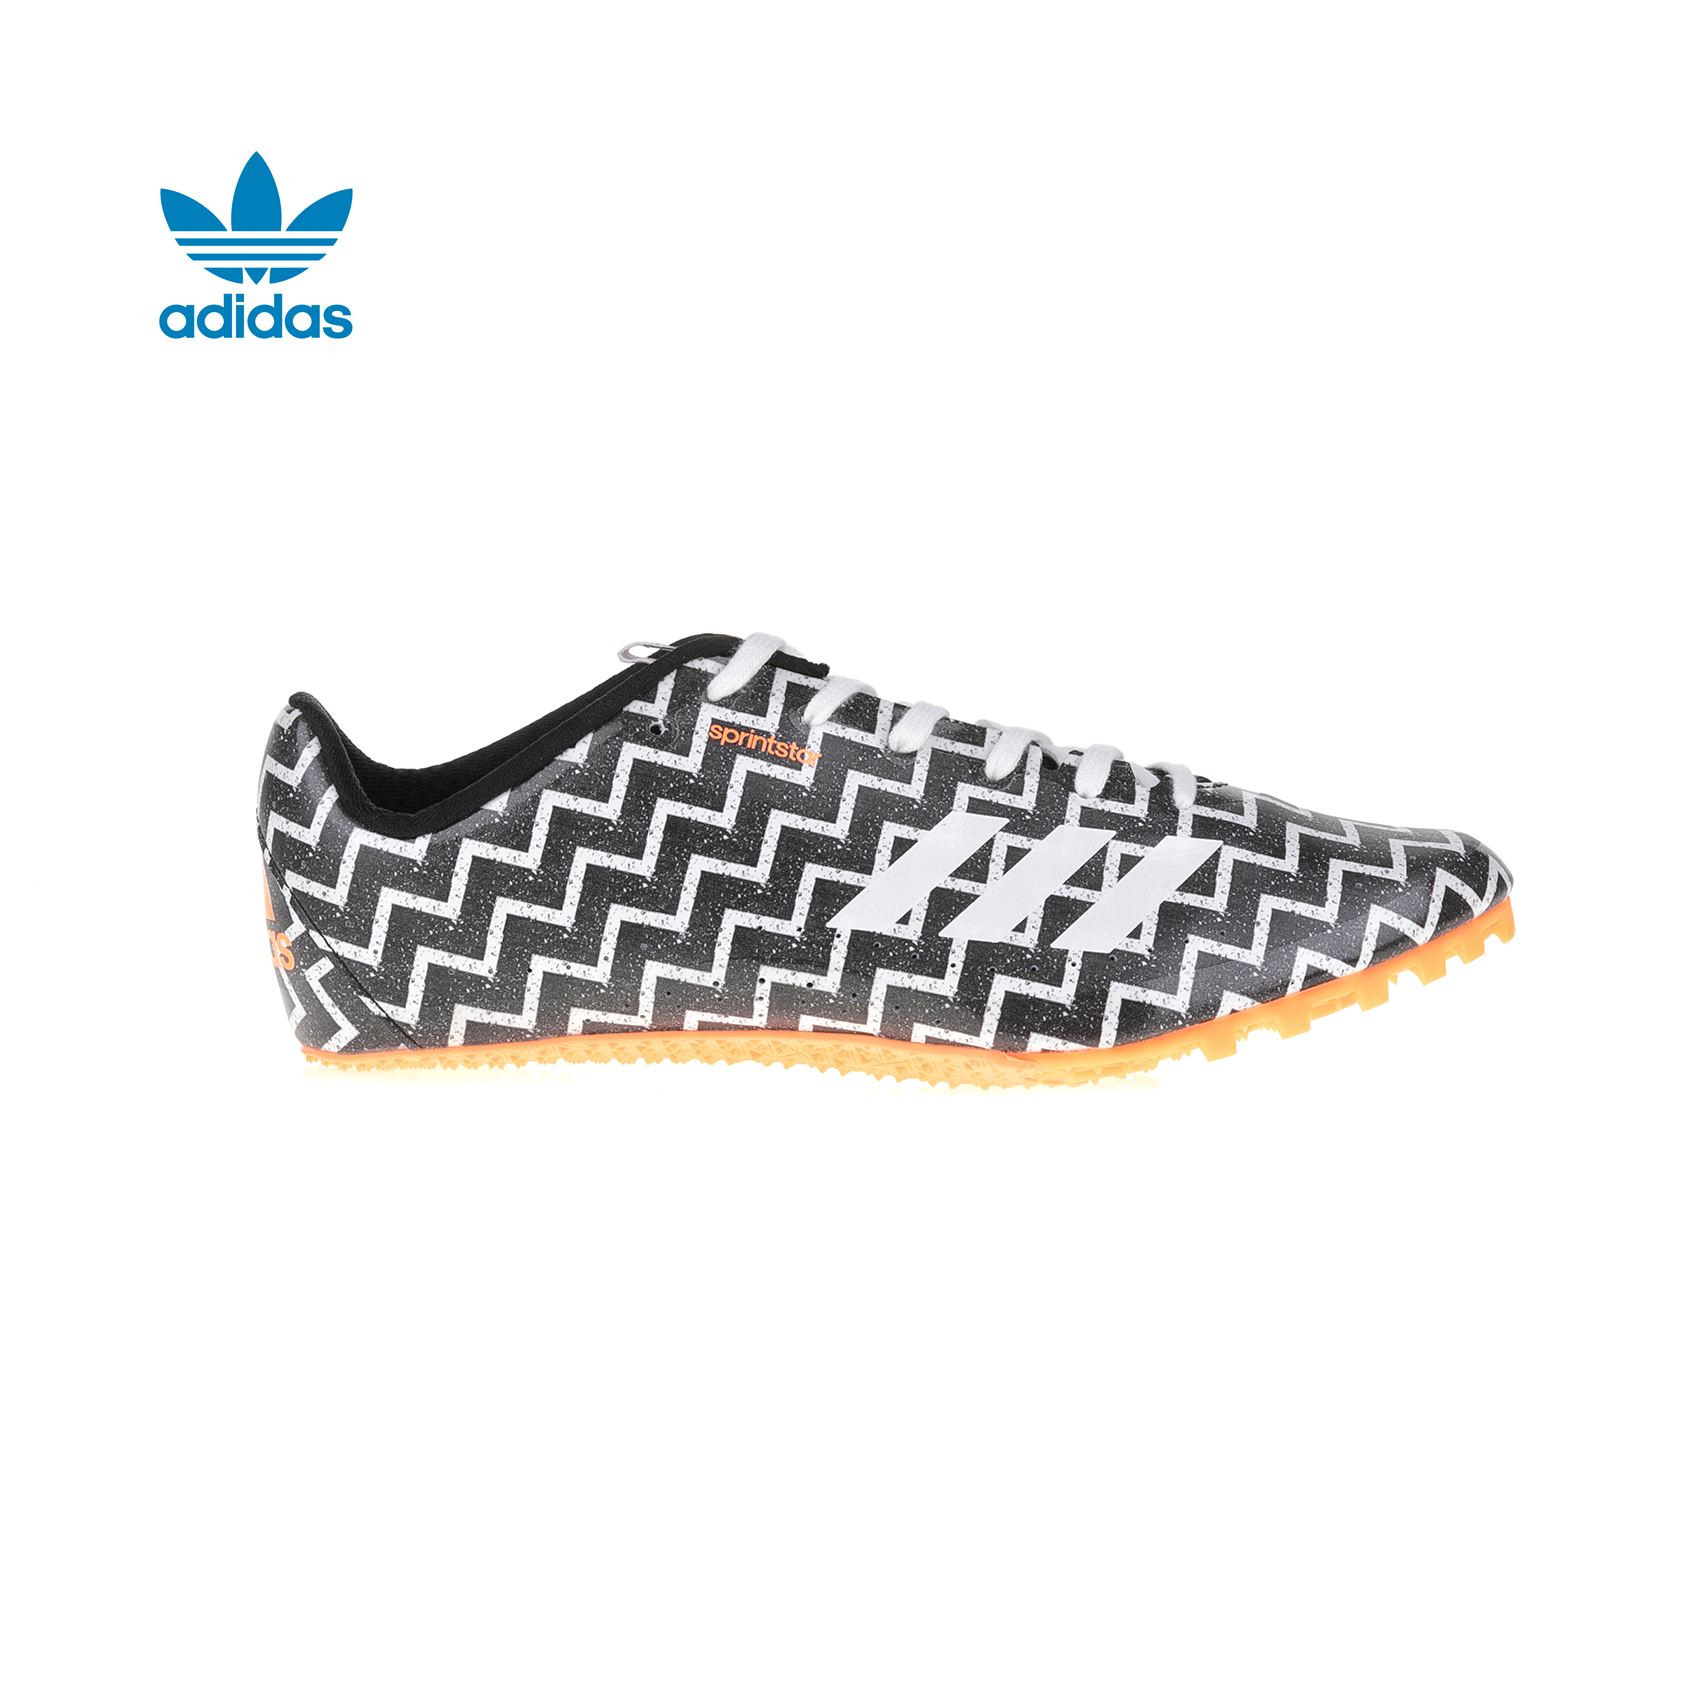 adidas Originals – Ανδρικά παπούτσια adidas sprintstar μαύρα